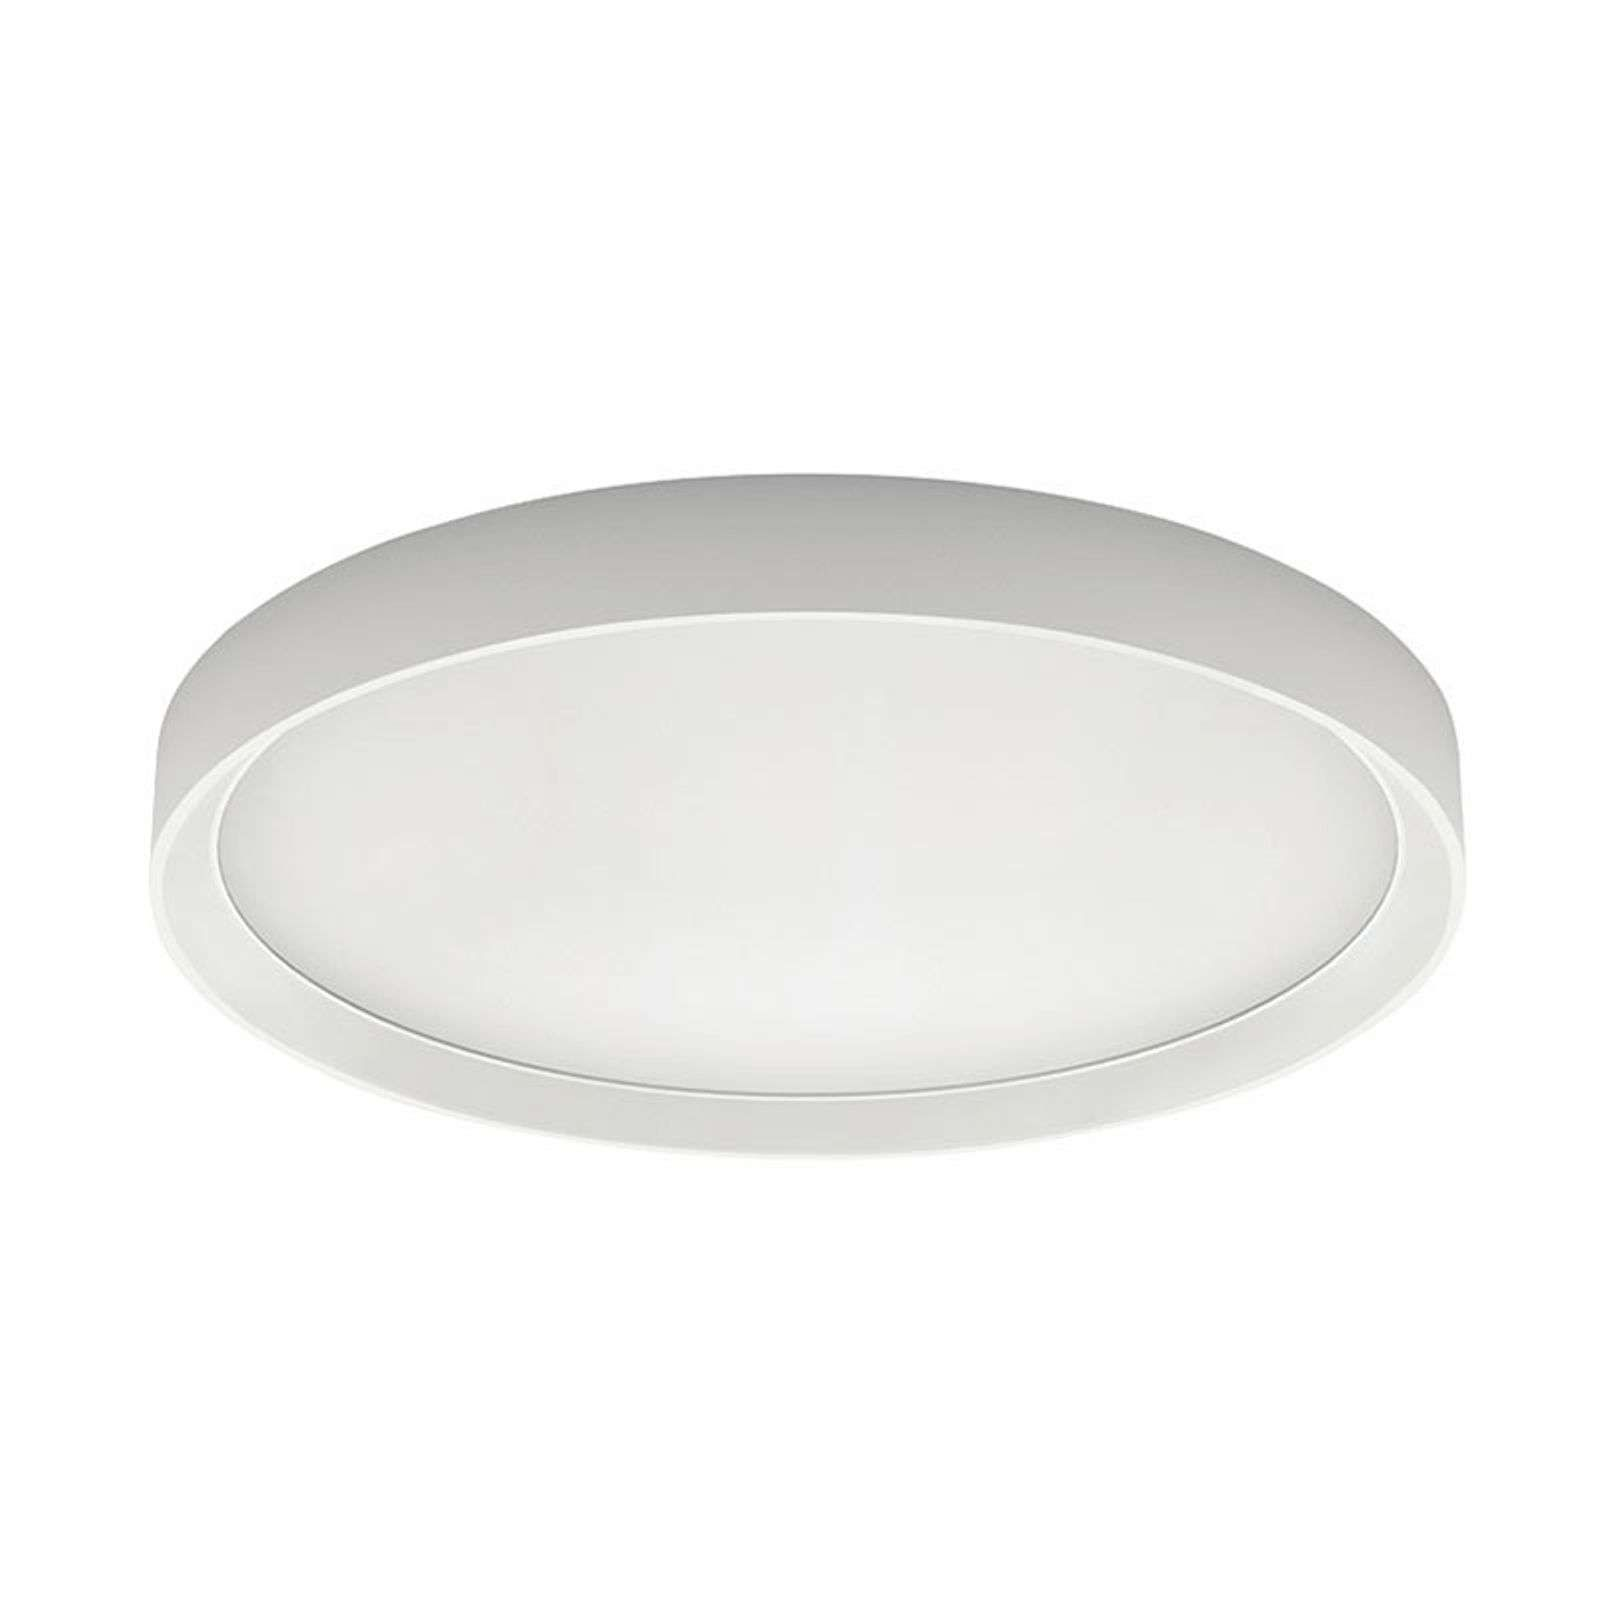 Tara R Led Ceiling Lamp Round O 51 Cm By Linea Light In 2020 Led Ceiling Ceiling Lights Led Ceiling Lights